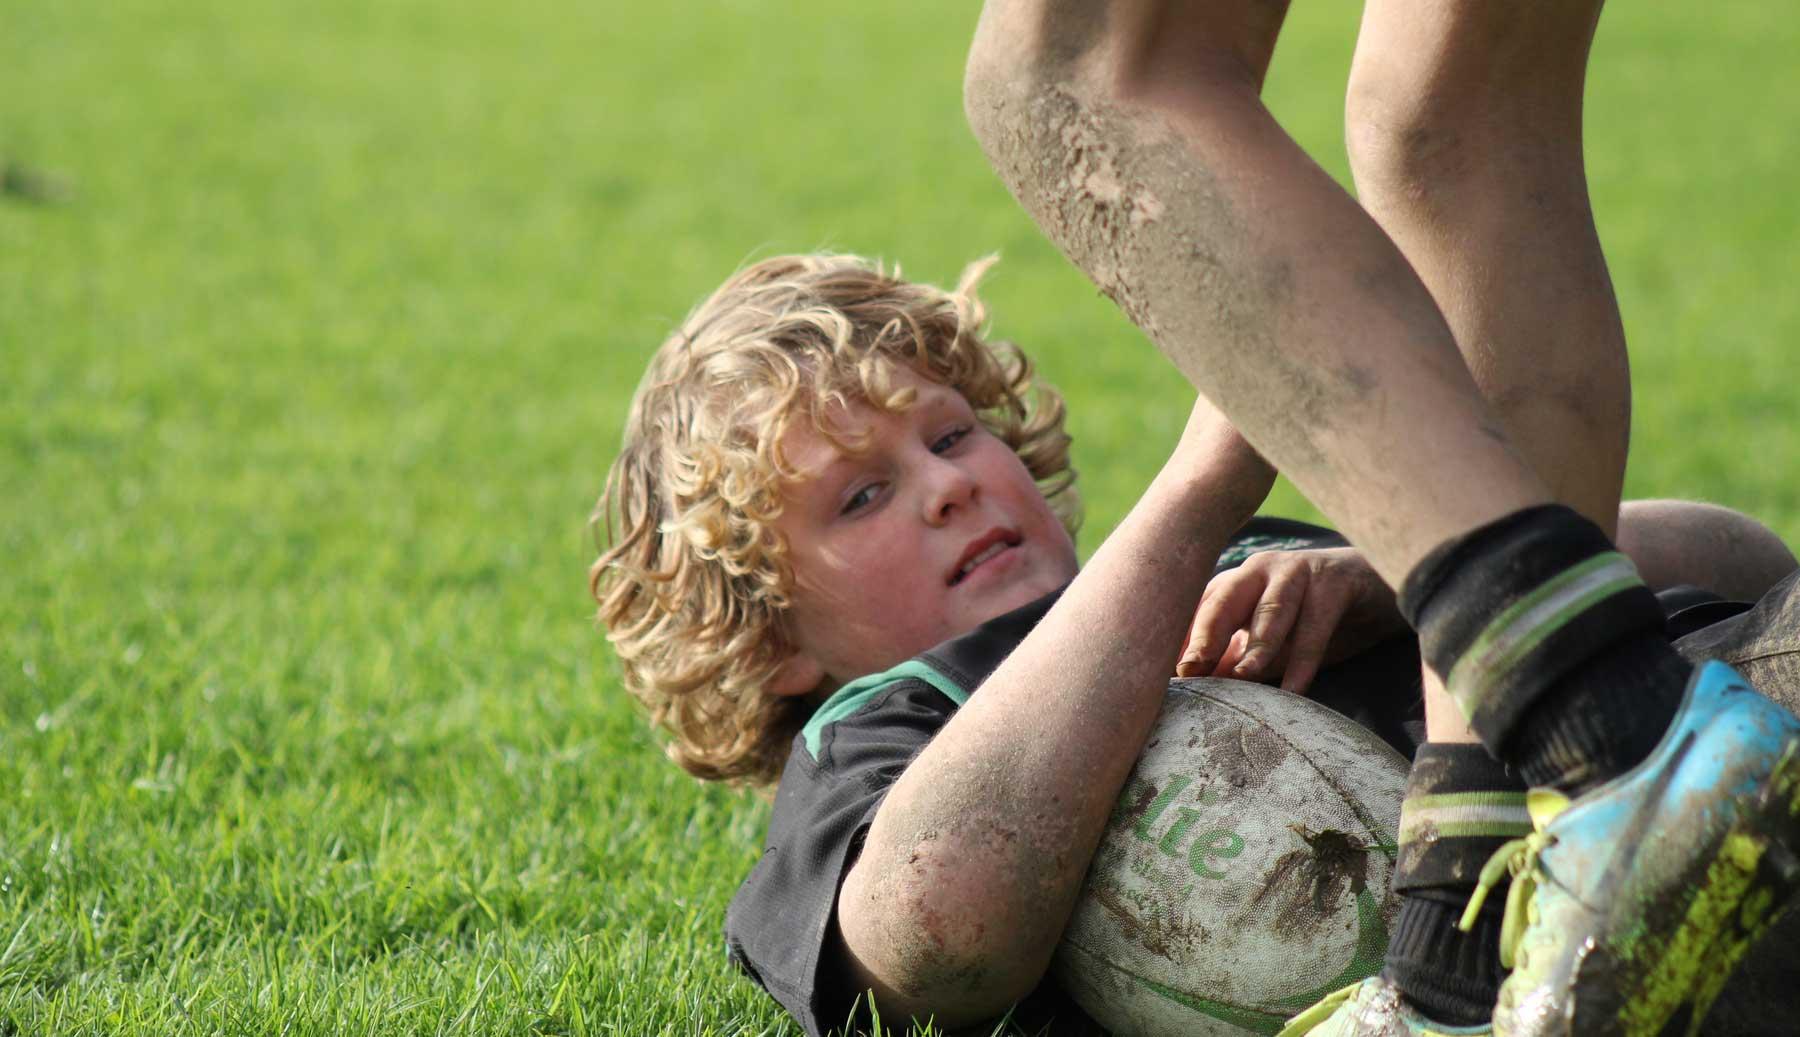 Raising Kiwi boys – the good, the bad and the muddy